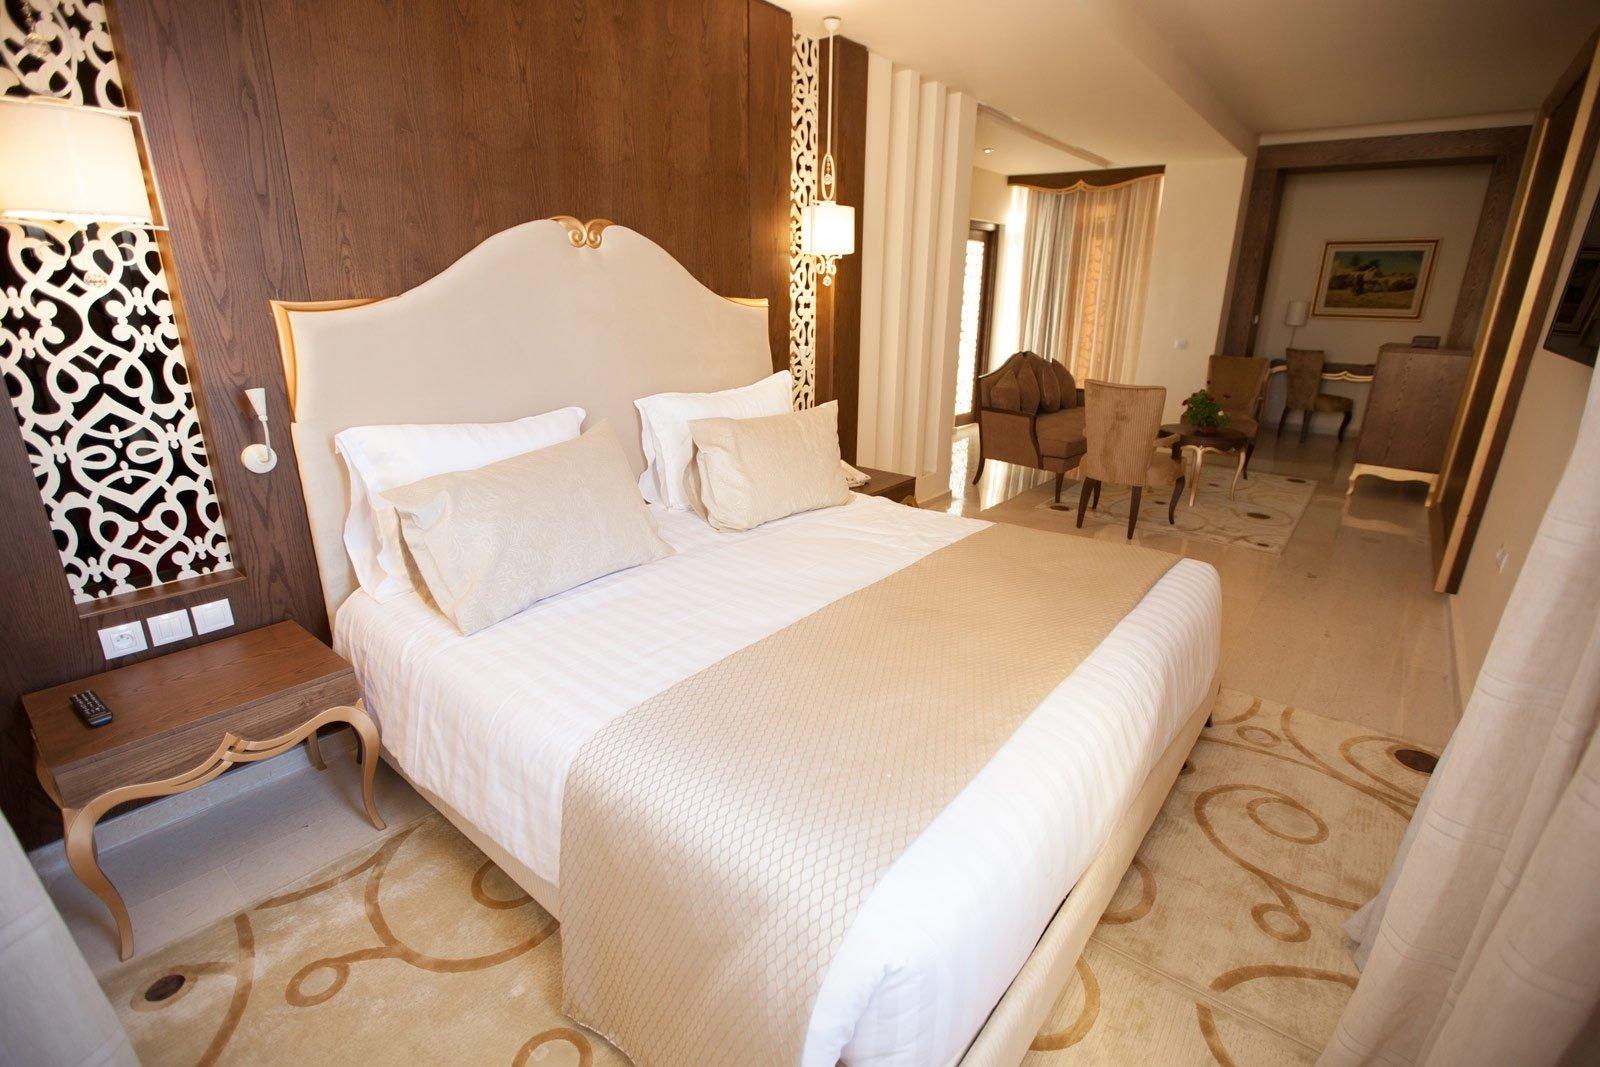 Sousse Palace Hotel & Spa, Sousse